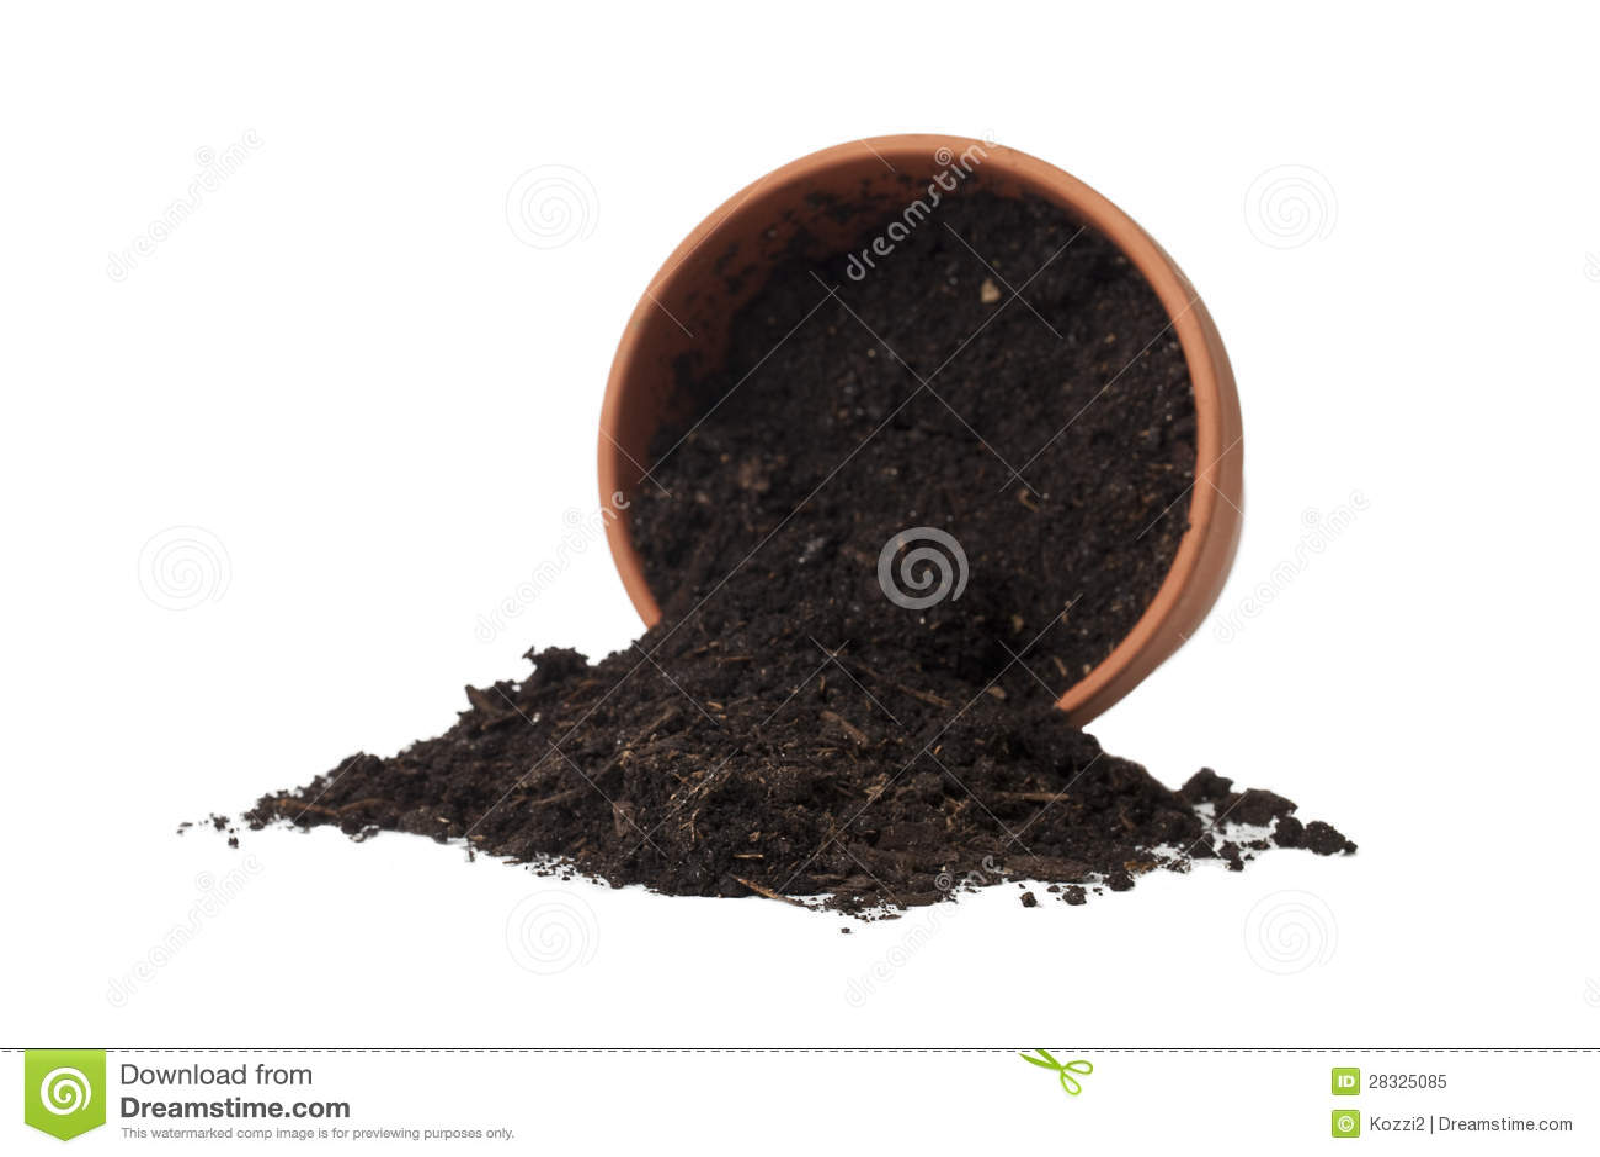 Spilled Soil In The Flower Pot Royalty Free Stock Image